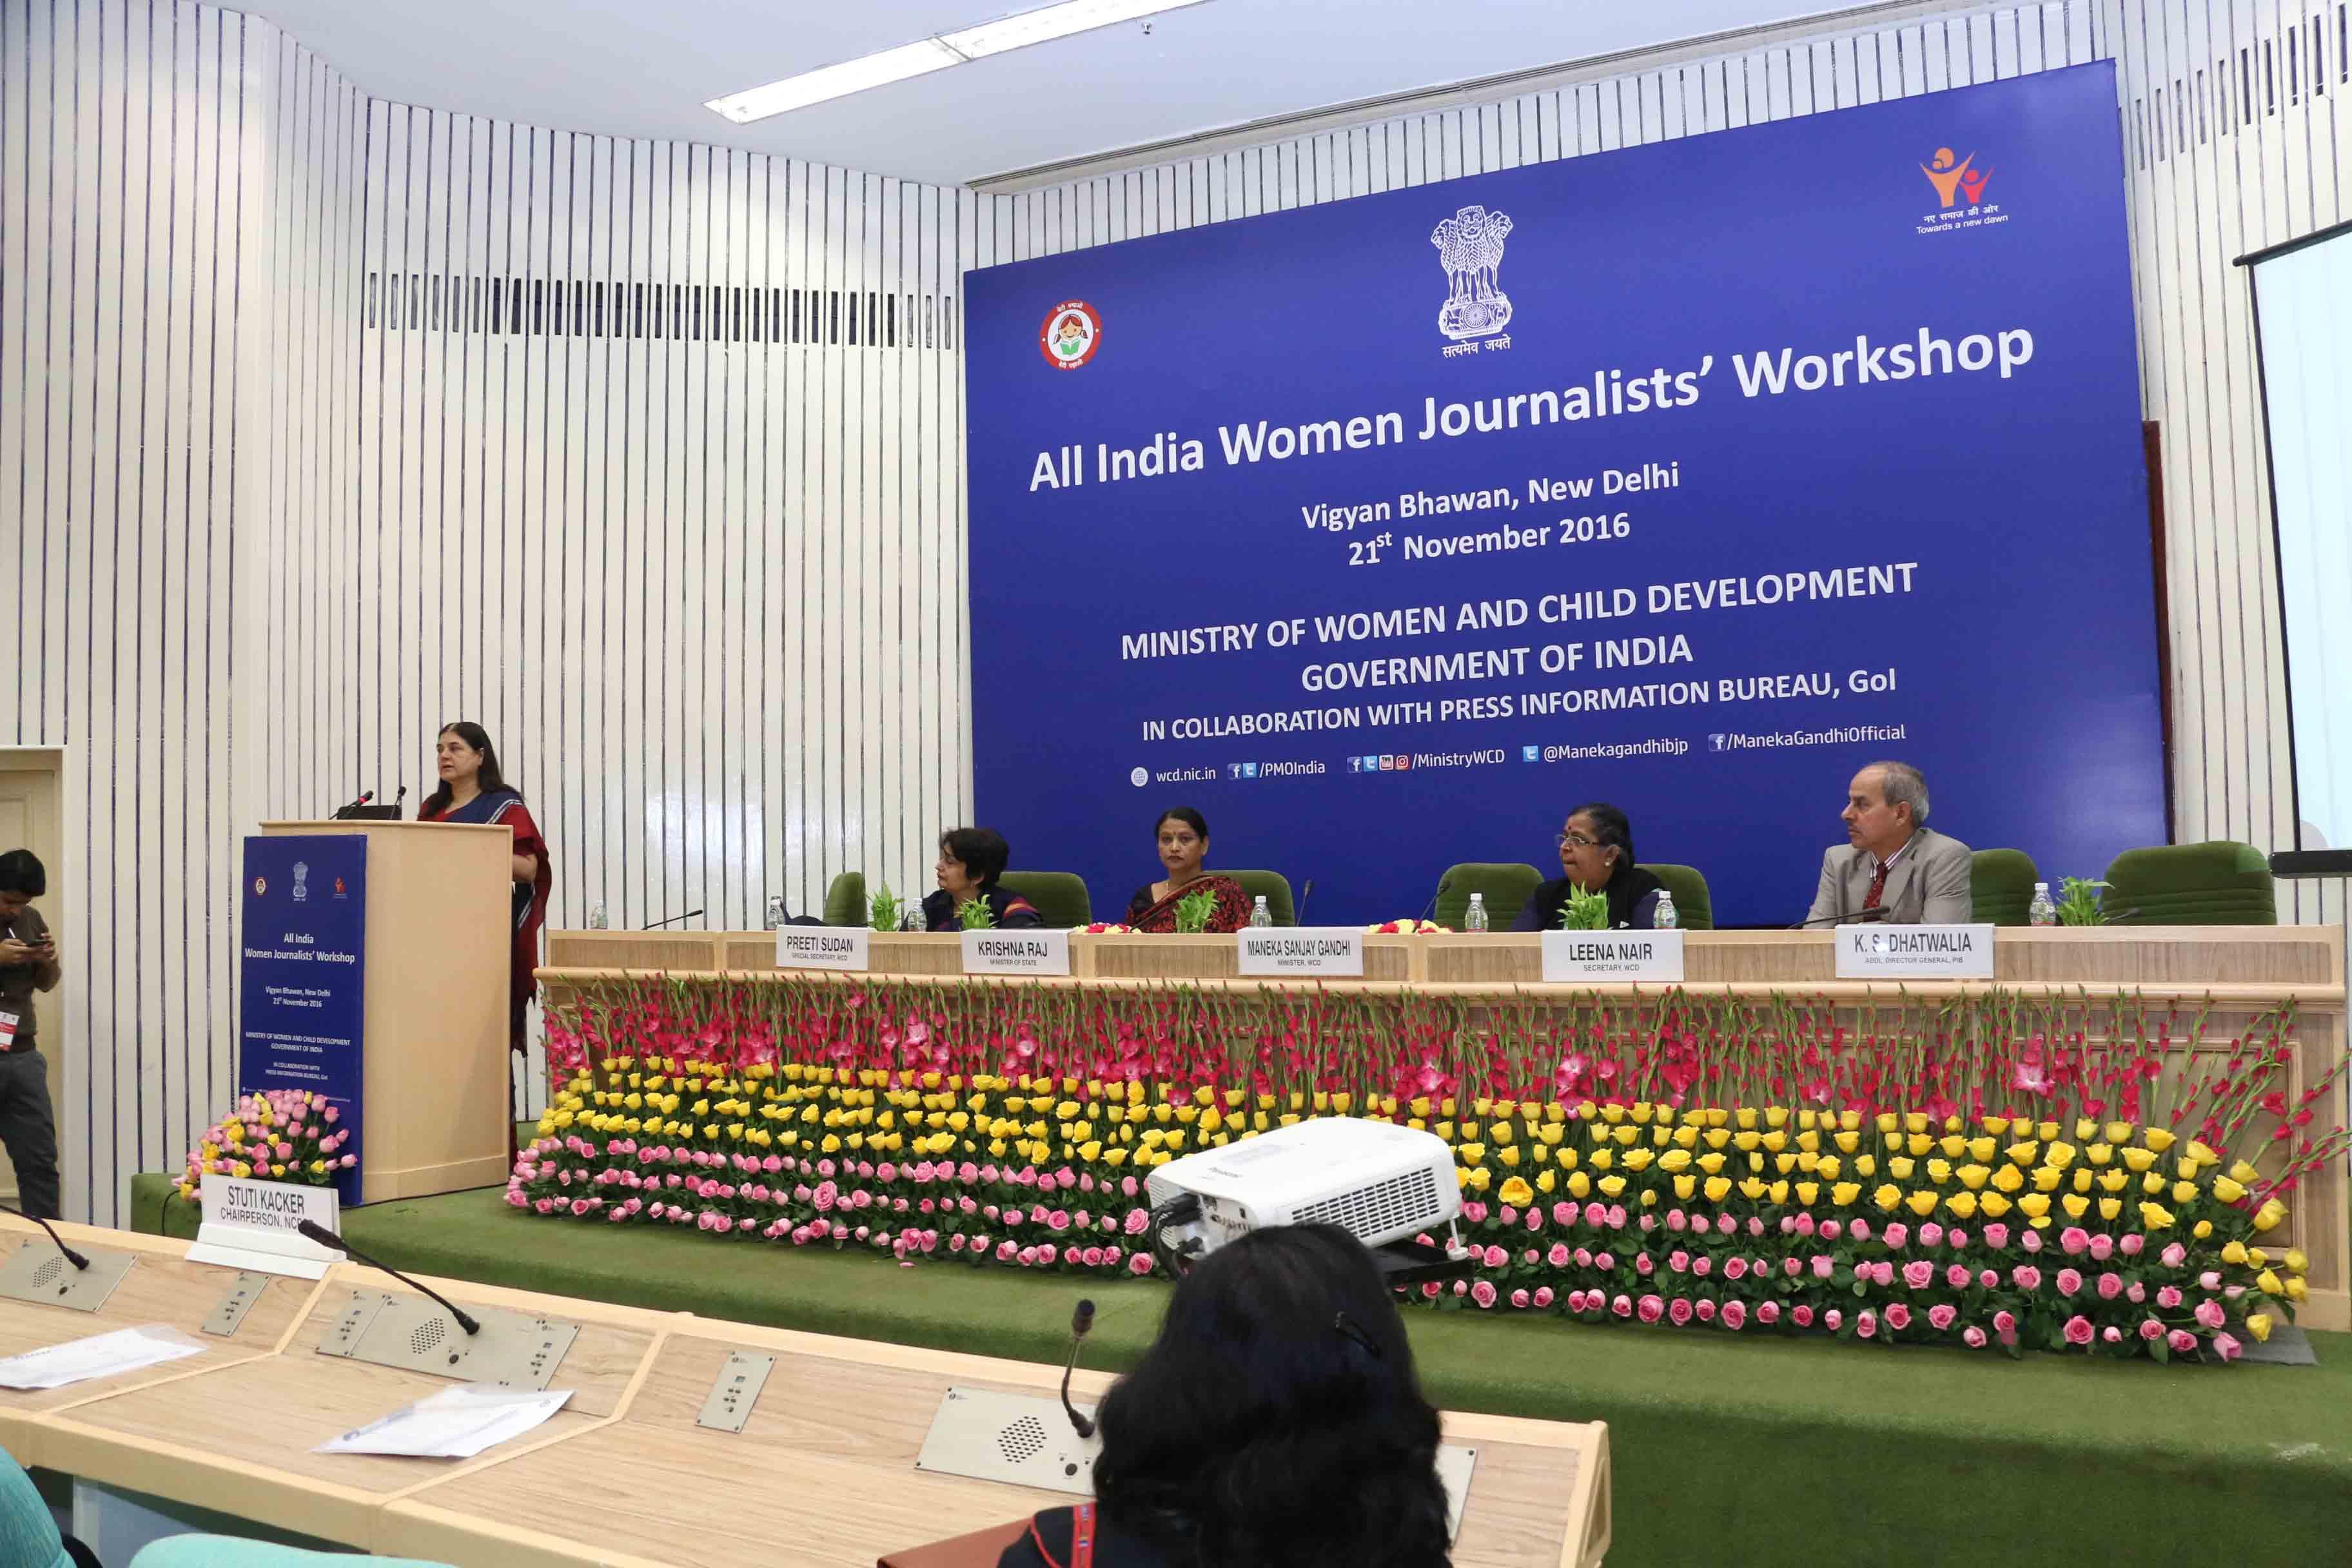 All India Women Journalists Workshop at Vigyan Bhawan 6